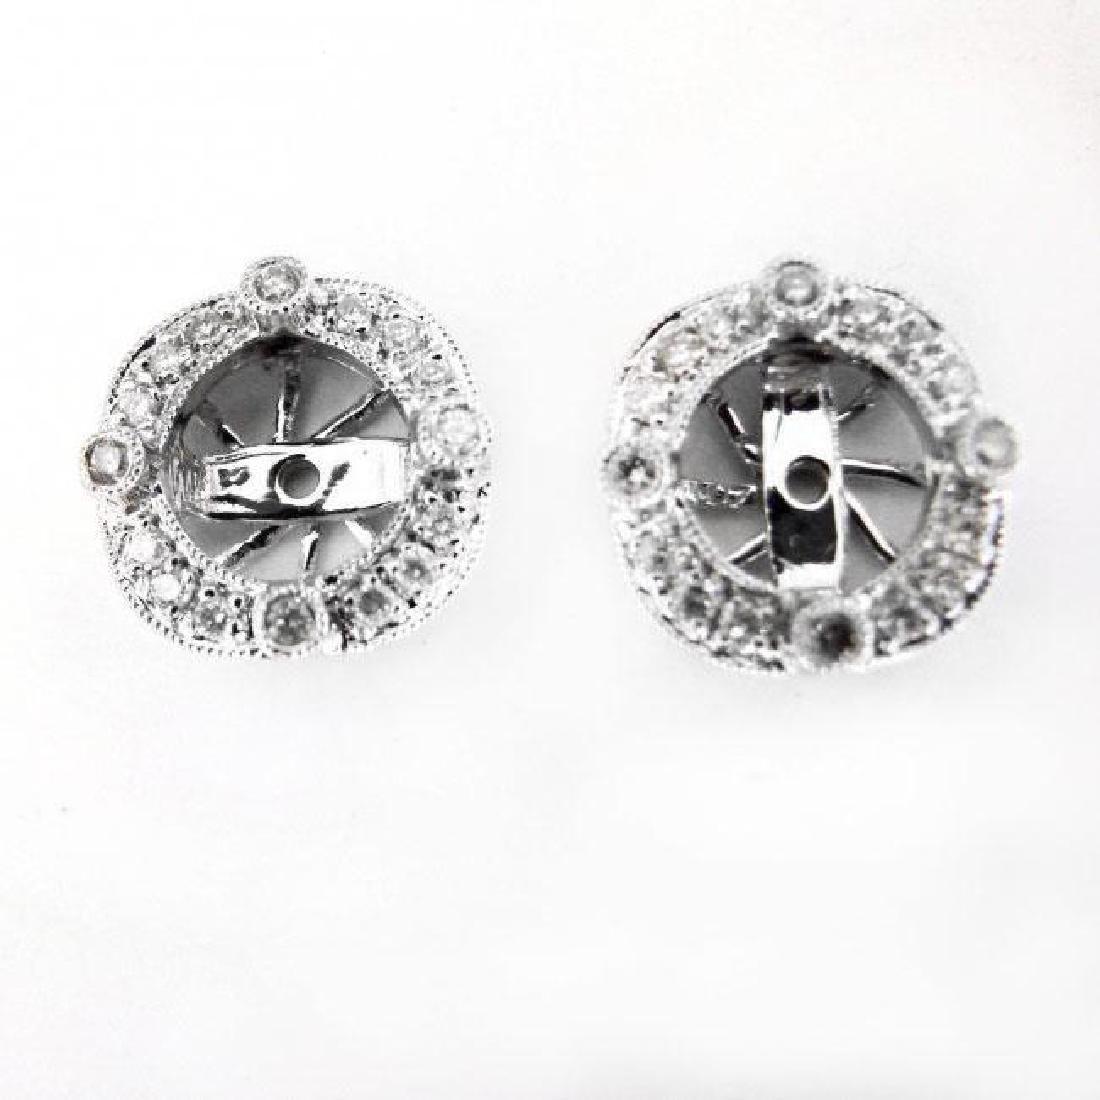 Jacket Stud Earrings Diamond 3.03Ct 18K White Gold - 6